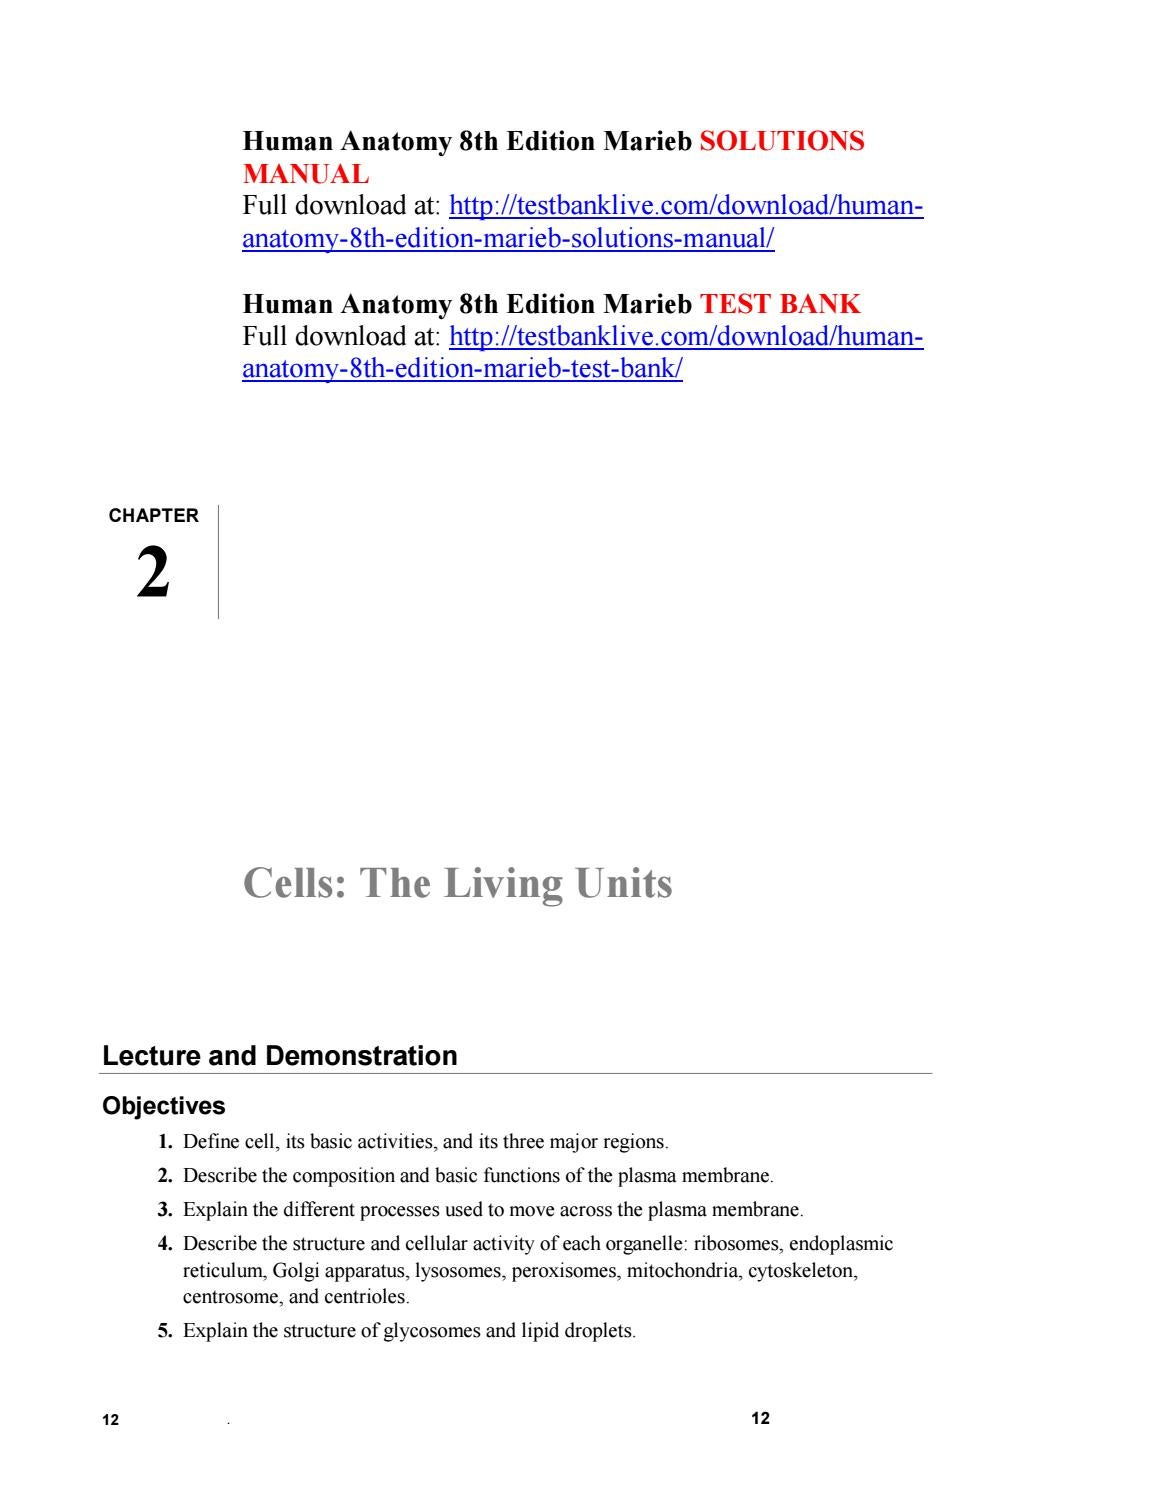 Human anatomy 8th edition marieb solutions manual by ghockje - issuu